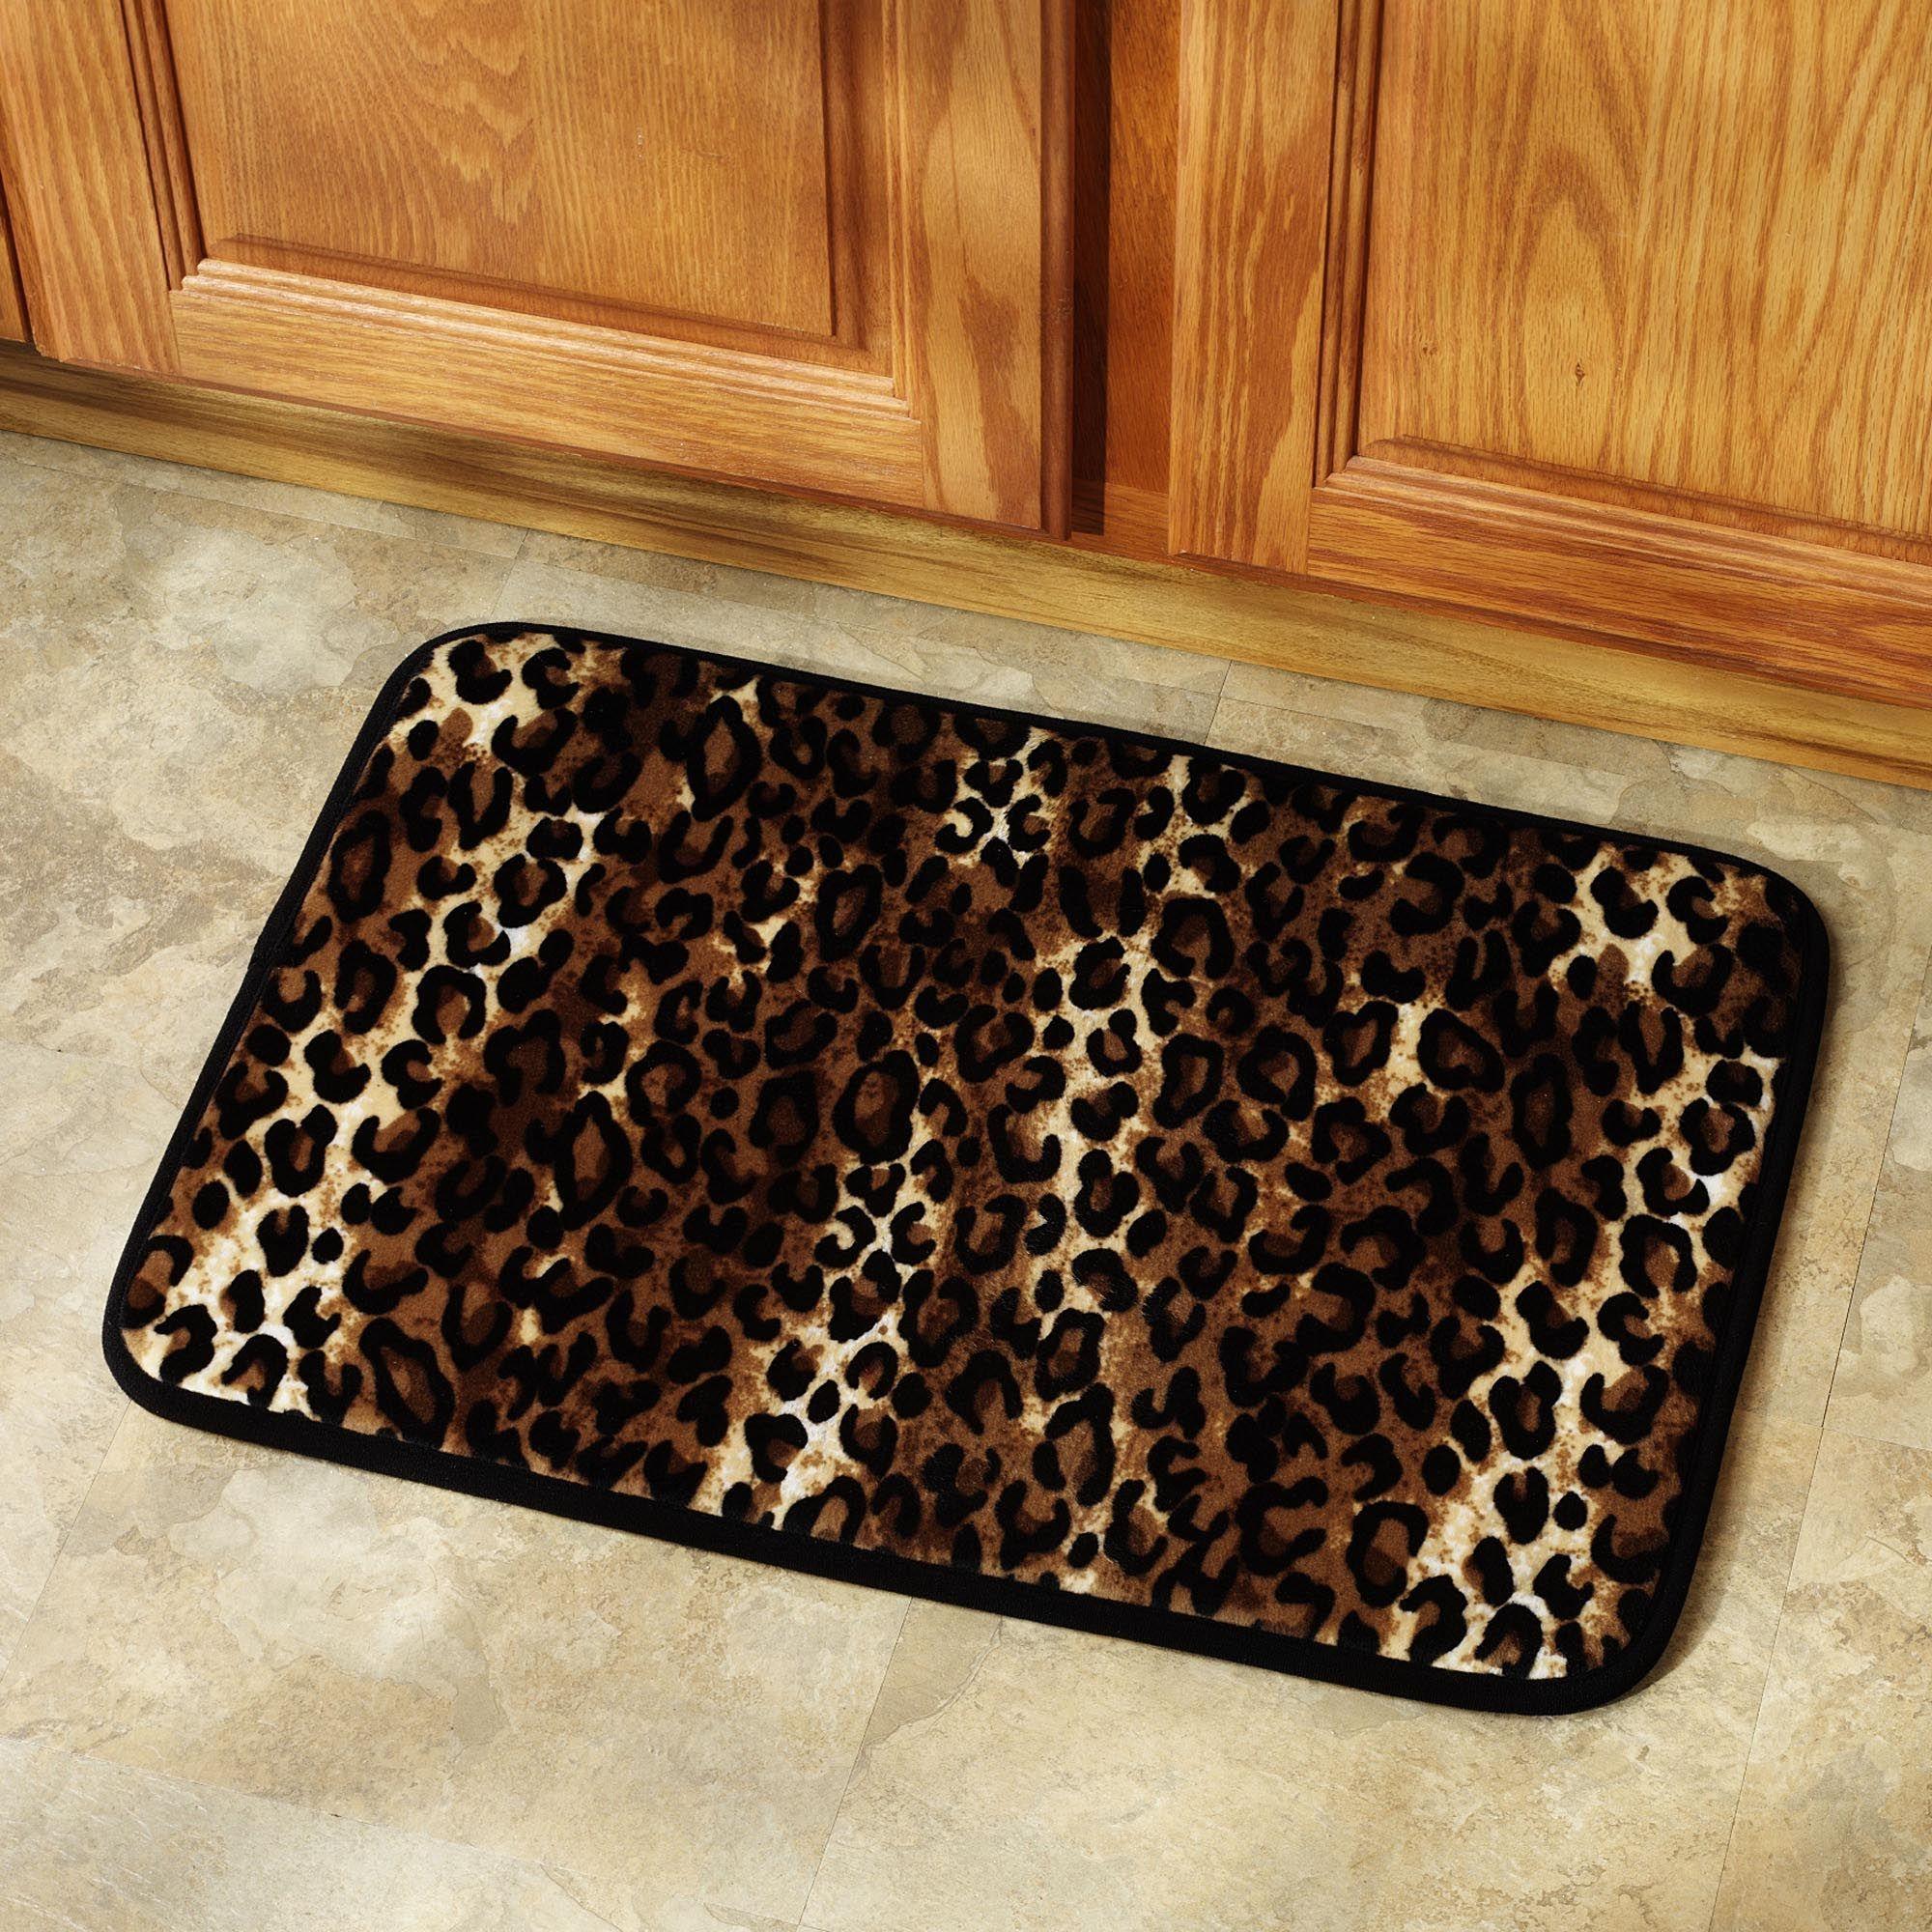 Leopard Print Bath Rug Leopard Print Bathroom Animal Print